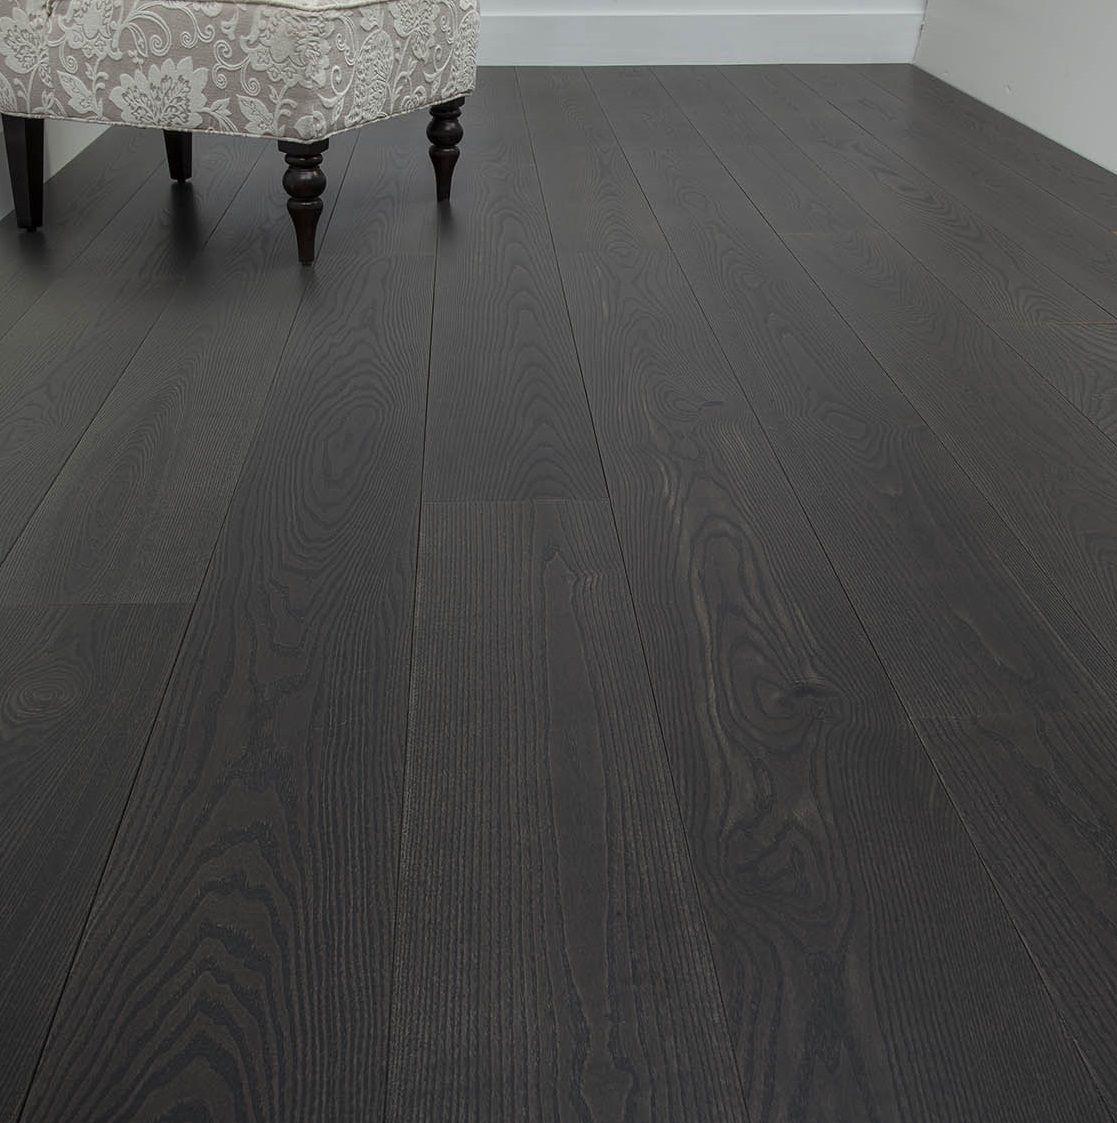 Black Laminate Plank Flooring